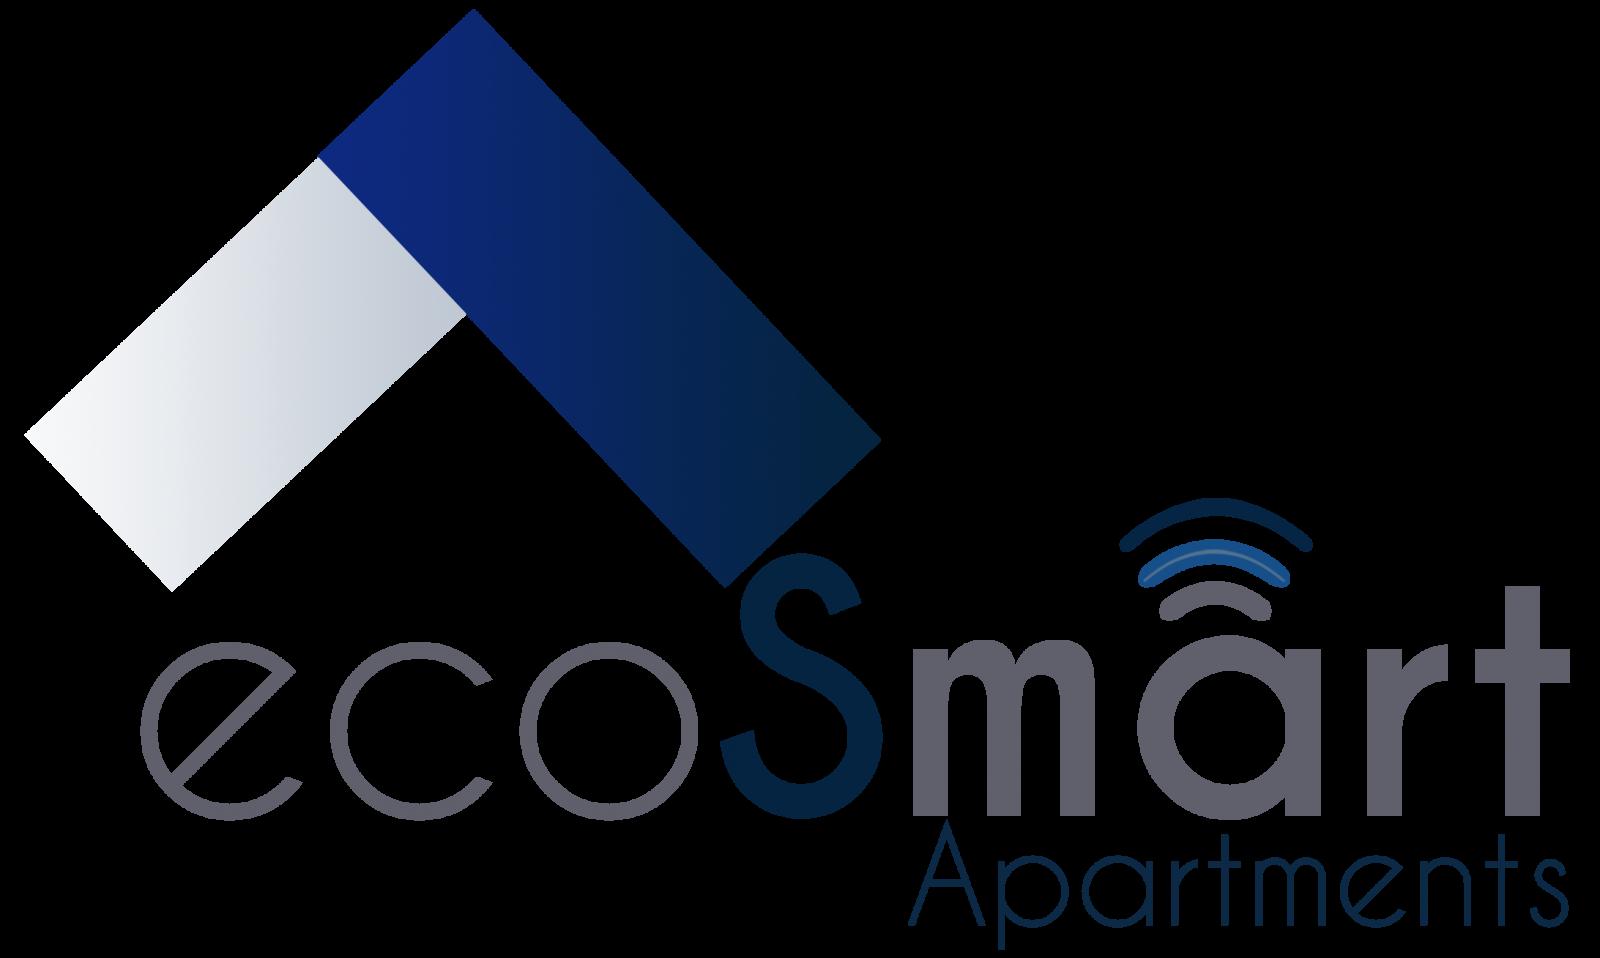 ecoSmart Apartments